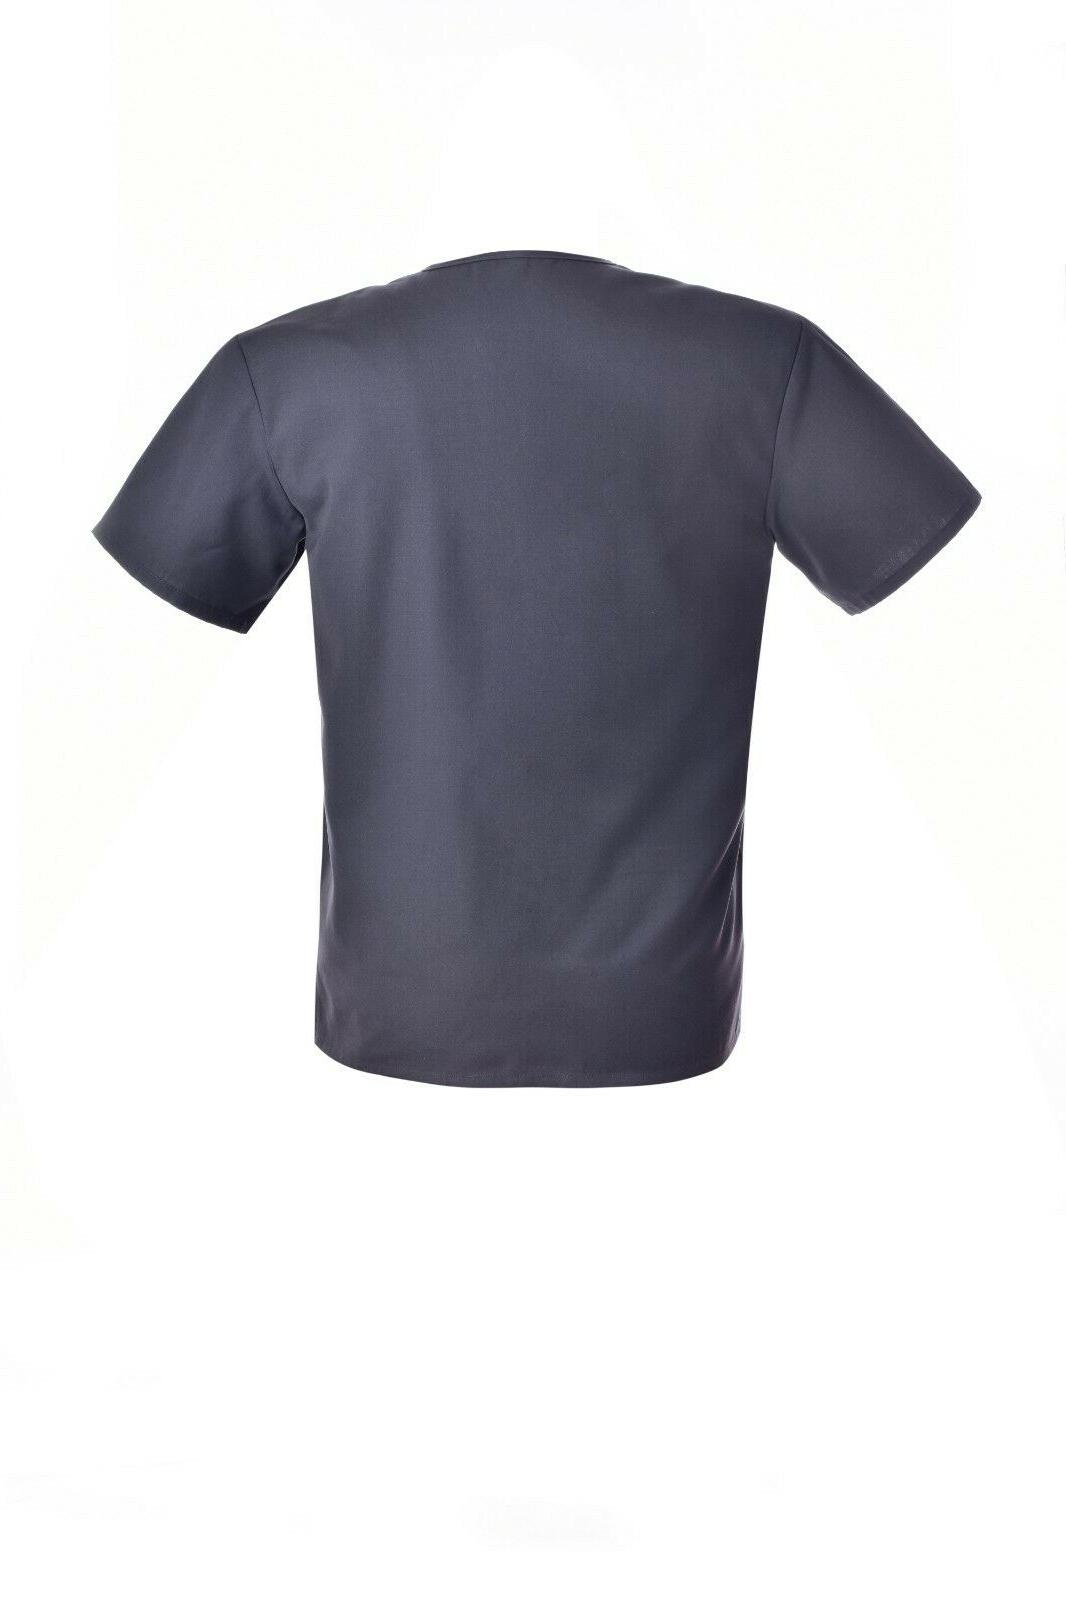 Unisex V-Neck Pant Men Women Medical Uniform